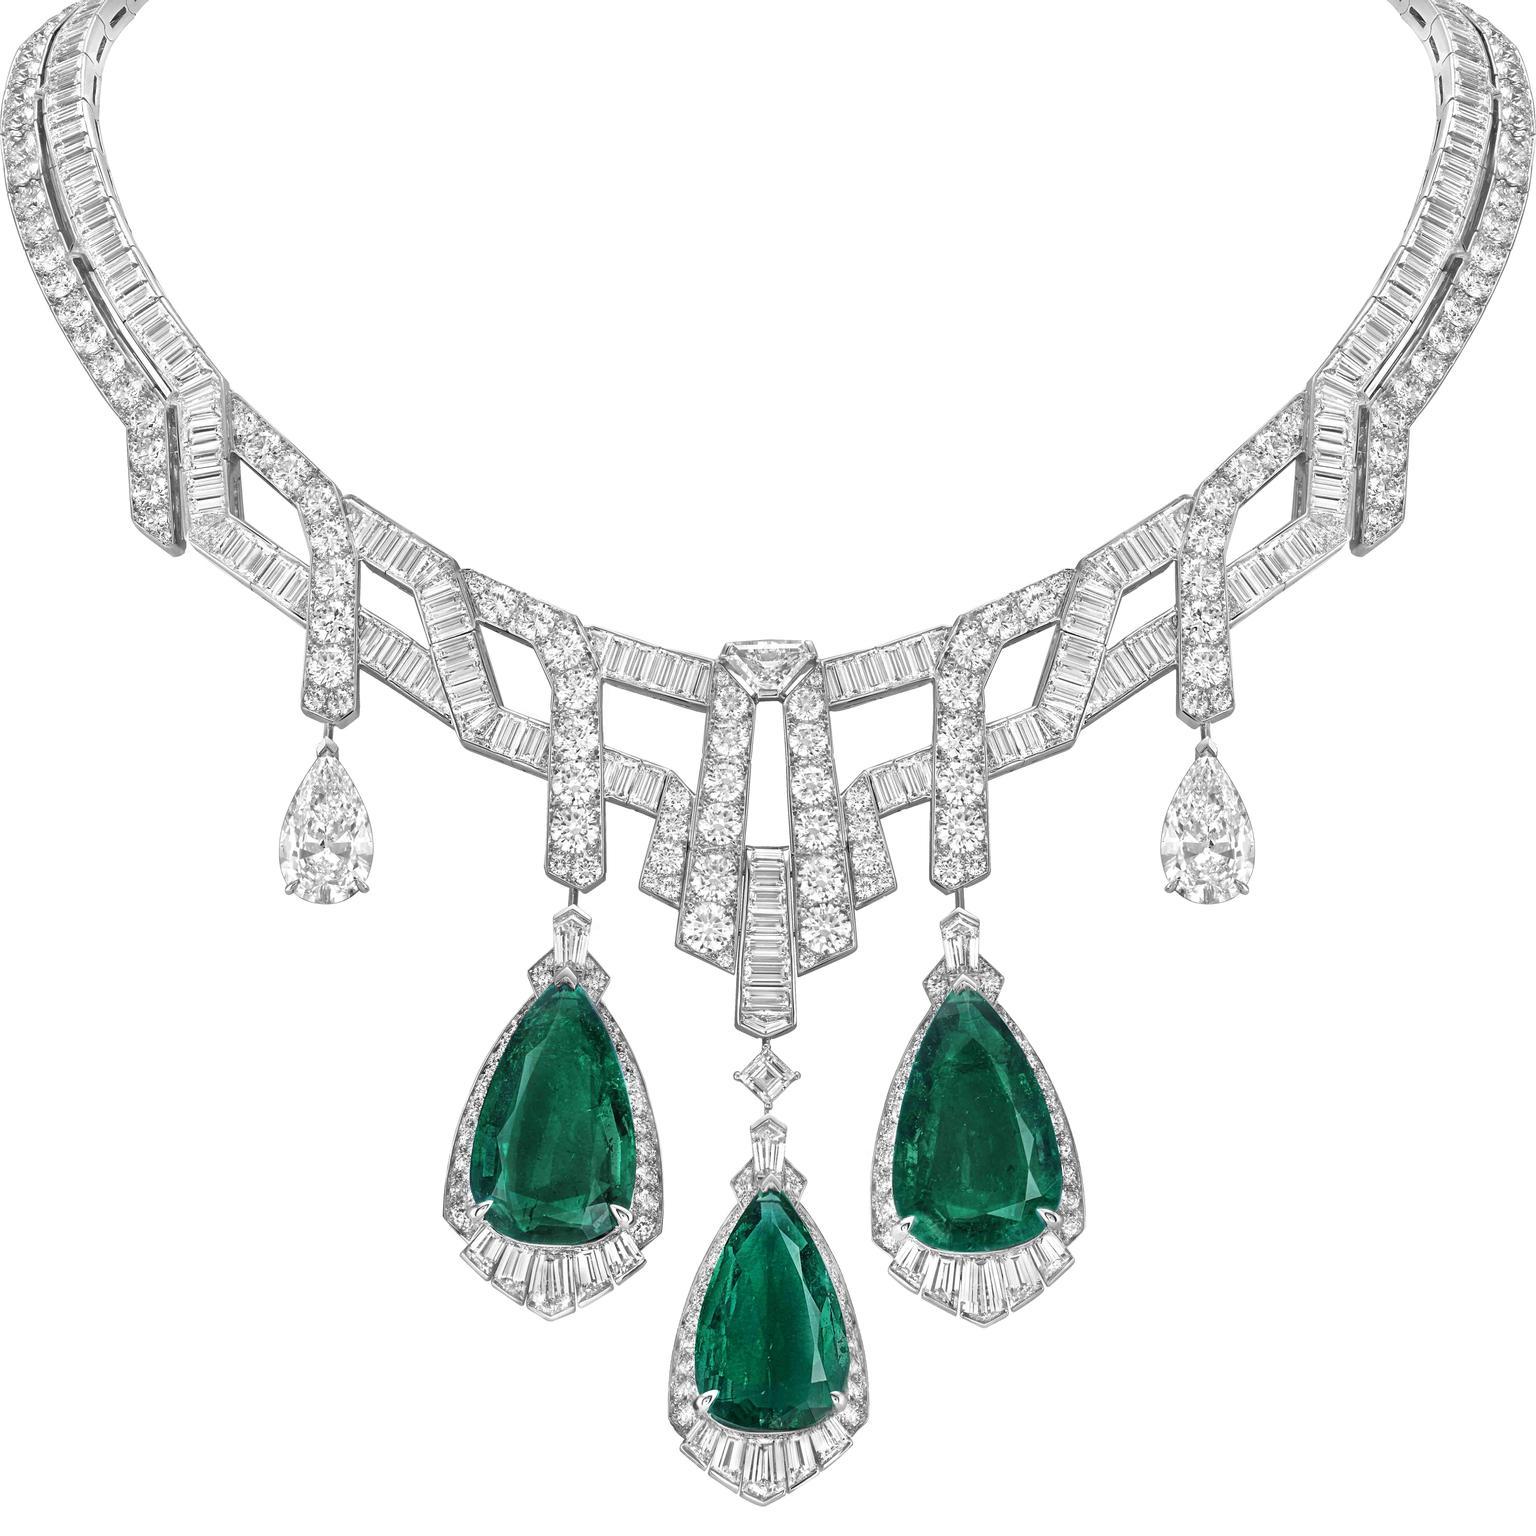 van_cleef__arpels_merveilles_demeraudes_necklace.jpg__1536x0_q75_crop-scale_subsampling-2_upscale-false